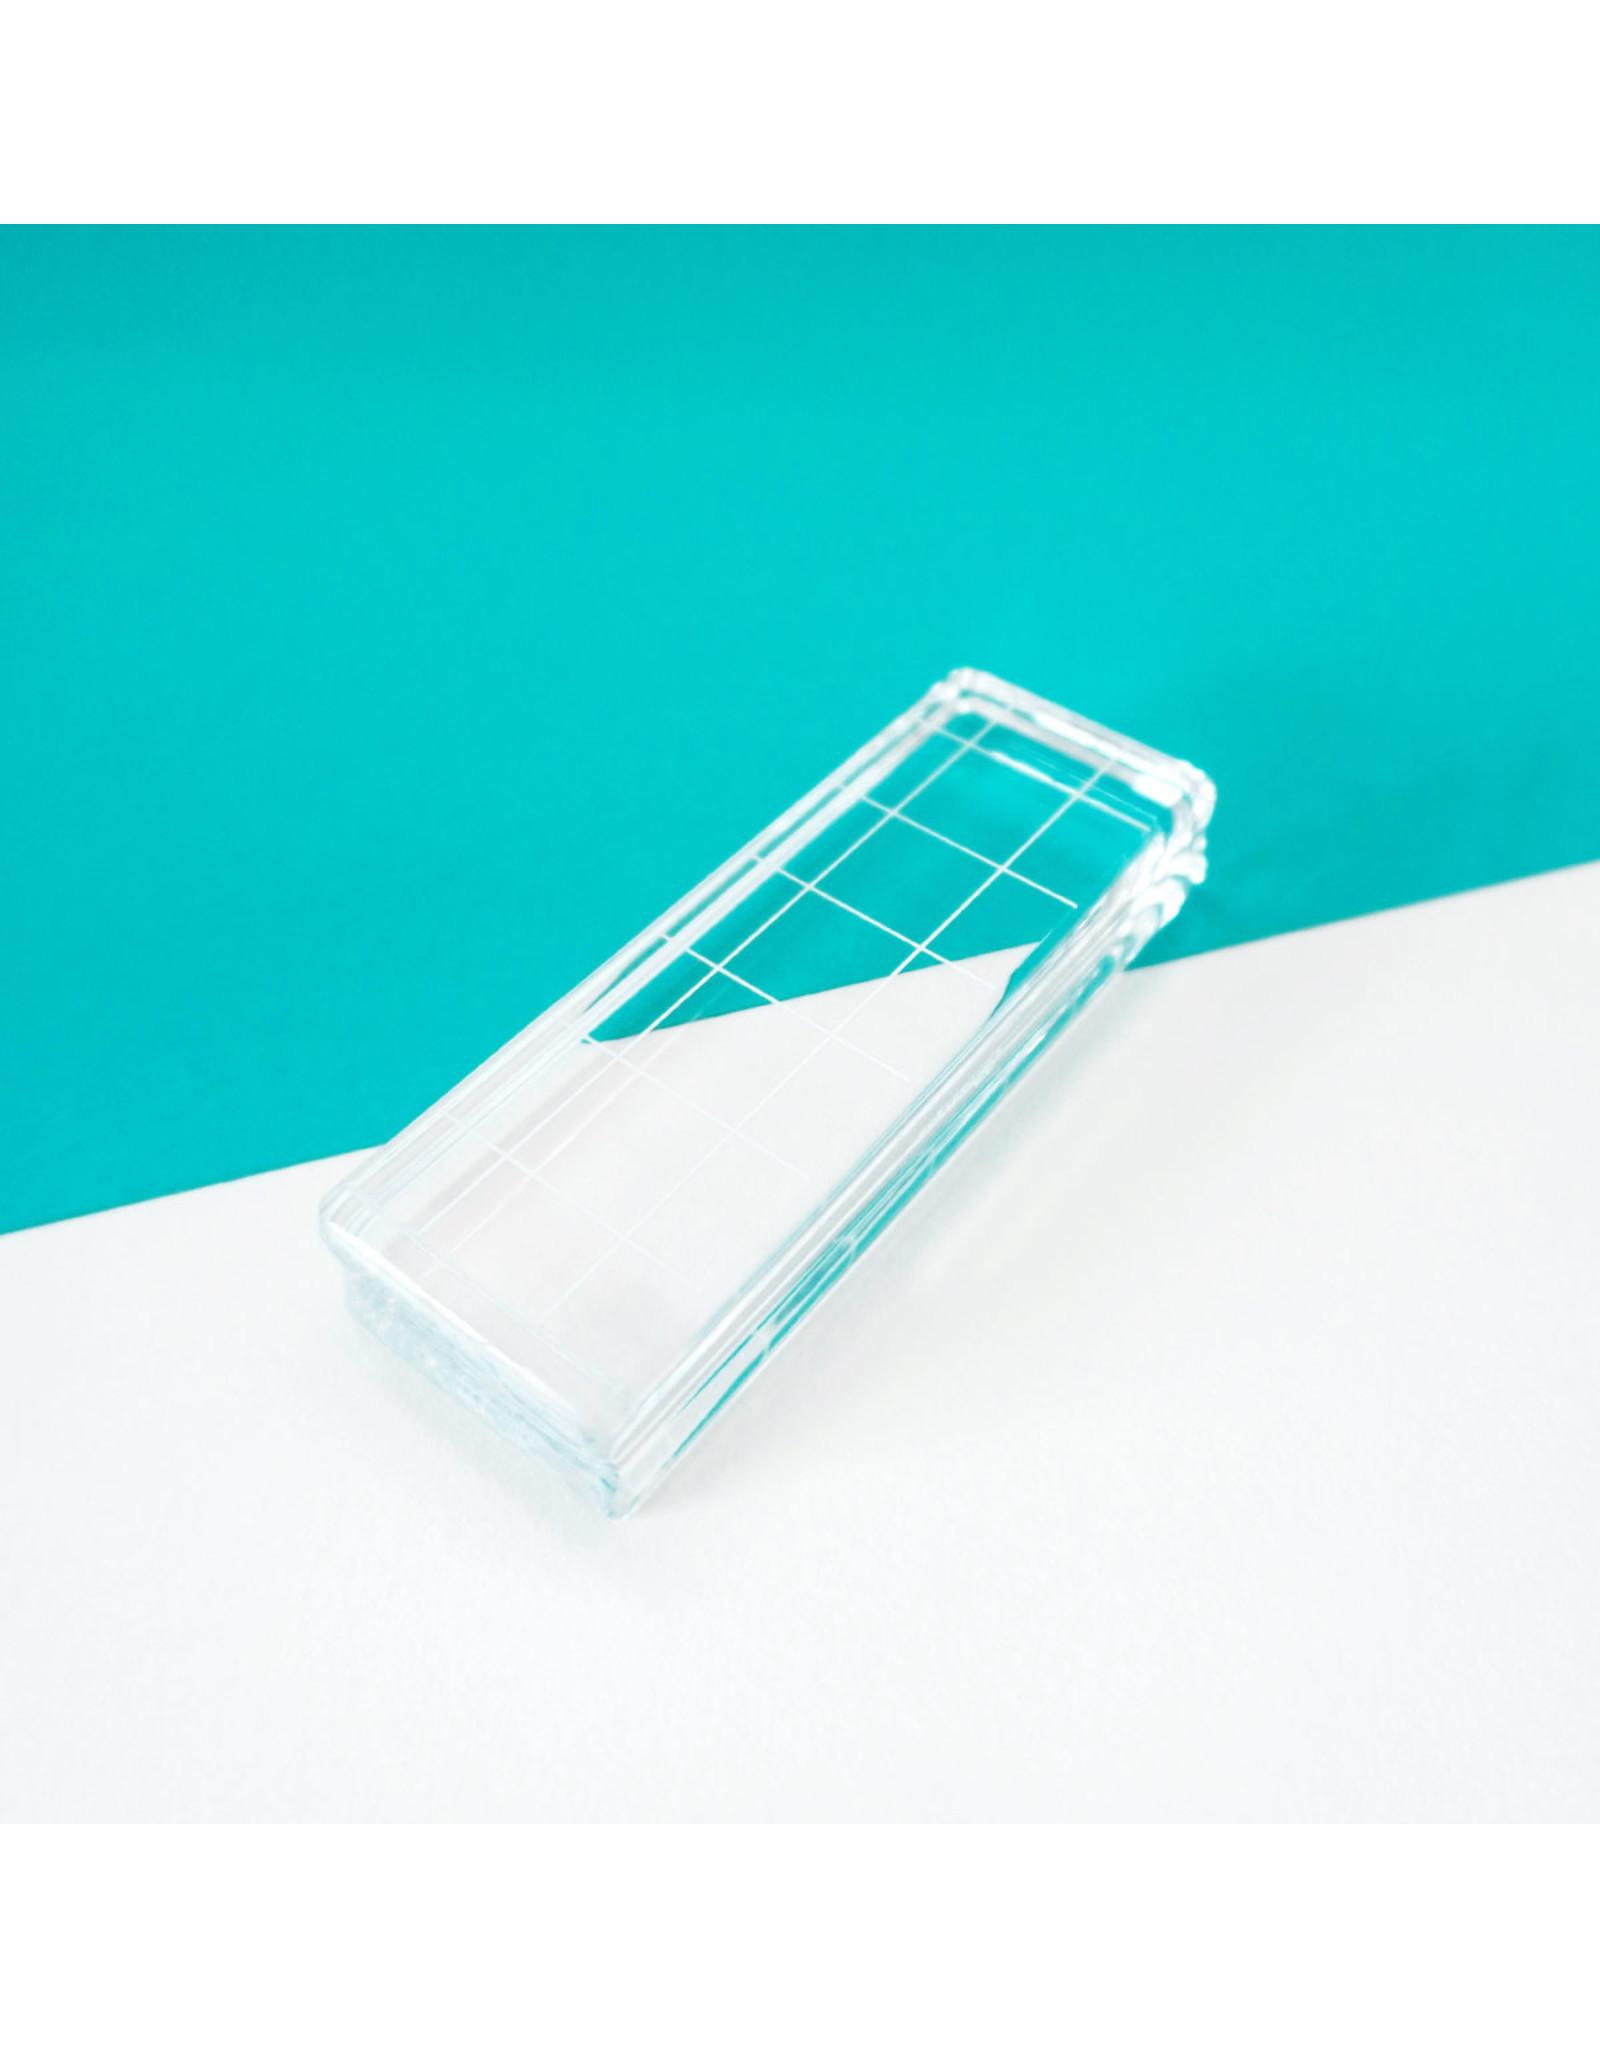 "Catherine Pooler Designs Acrylic Grid Stamping Block 1-1/4 x 3-1/2"""